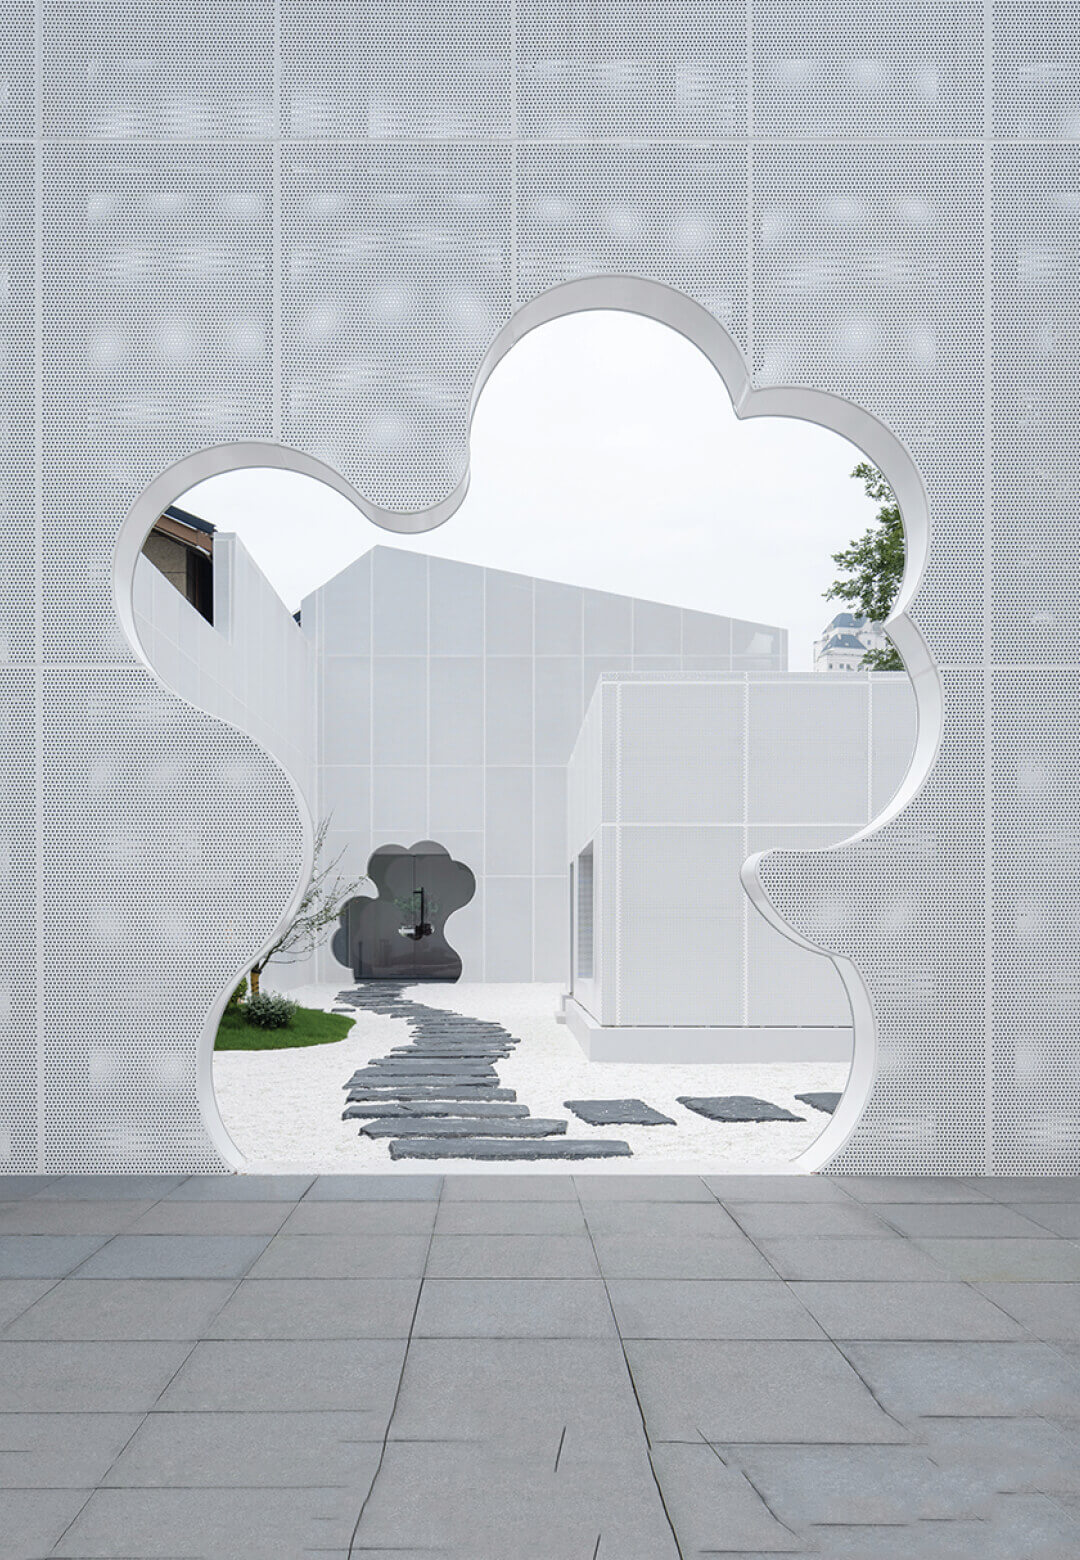 Books in Clouds - Duoyun Bookstore in Huangyan by Wutopia Lab | Duoyun Bookstore in Huangyan by Wutopia Lab | STIRworld